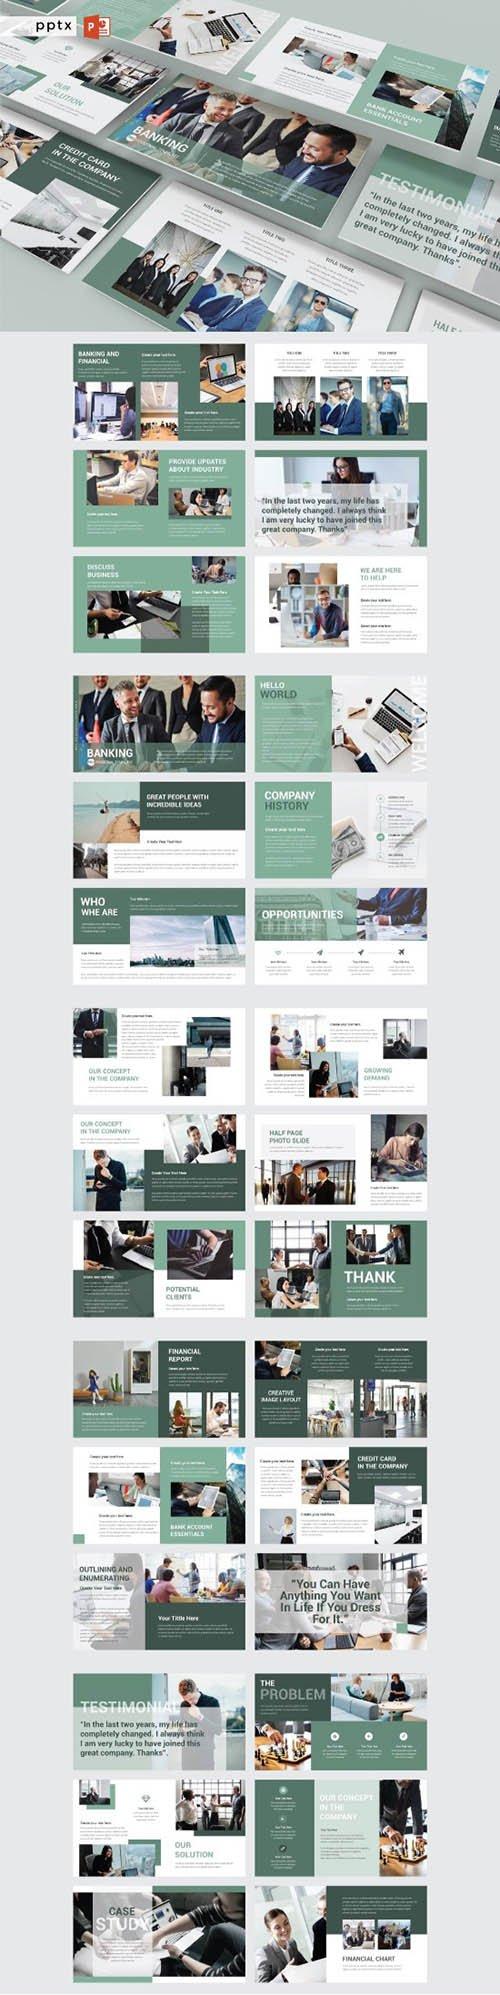 BANKING Presentation, Keynote and Google Slides Templates